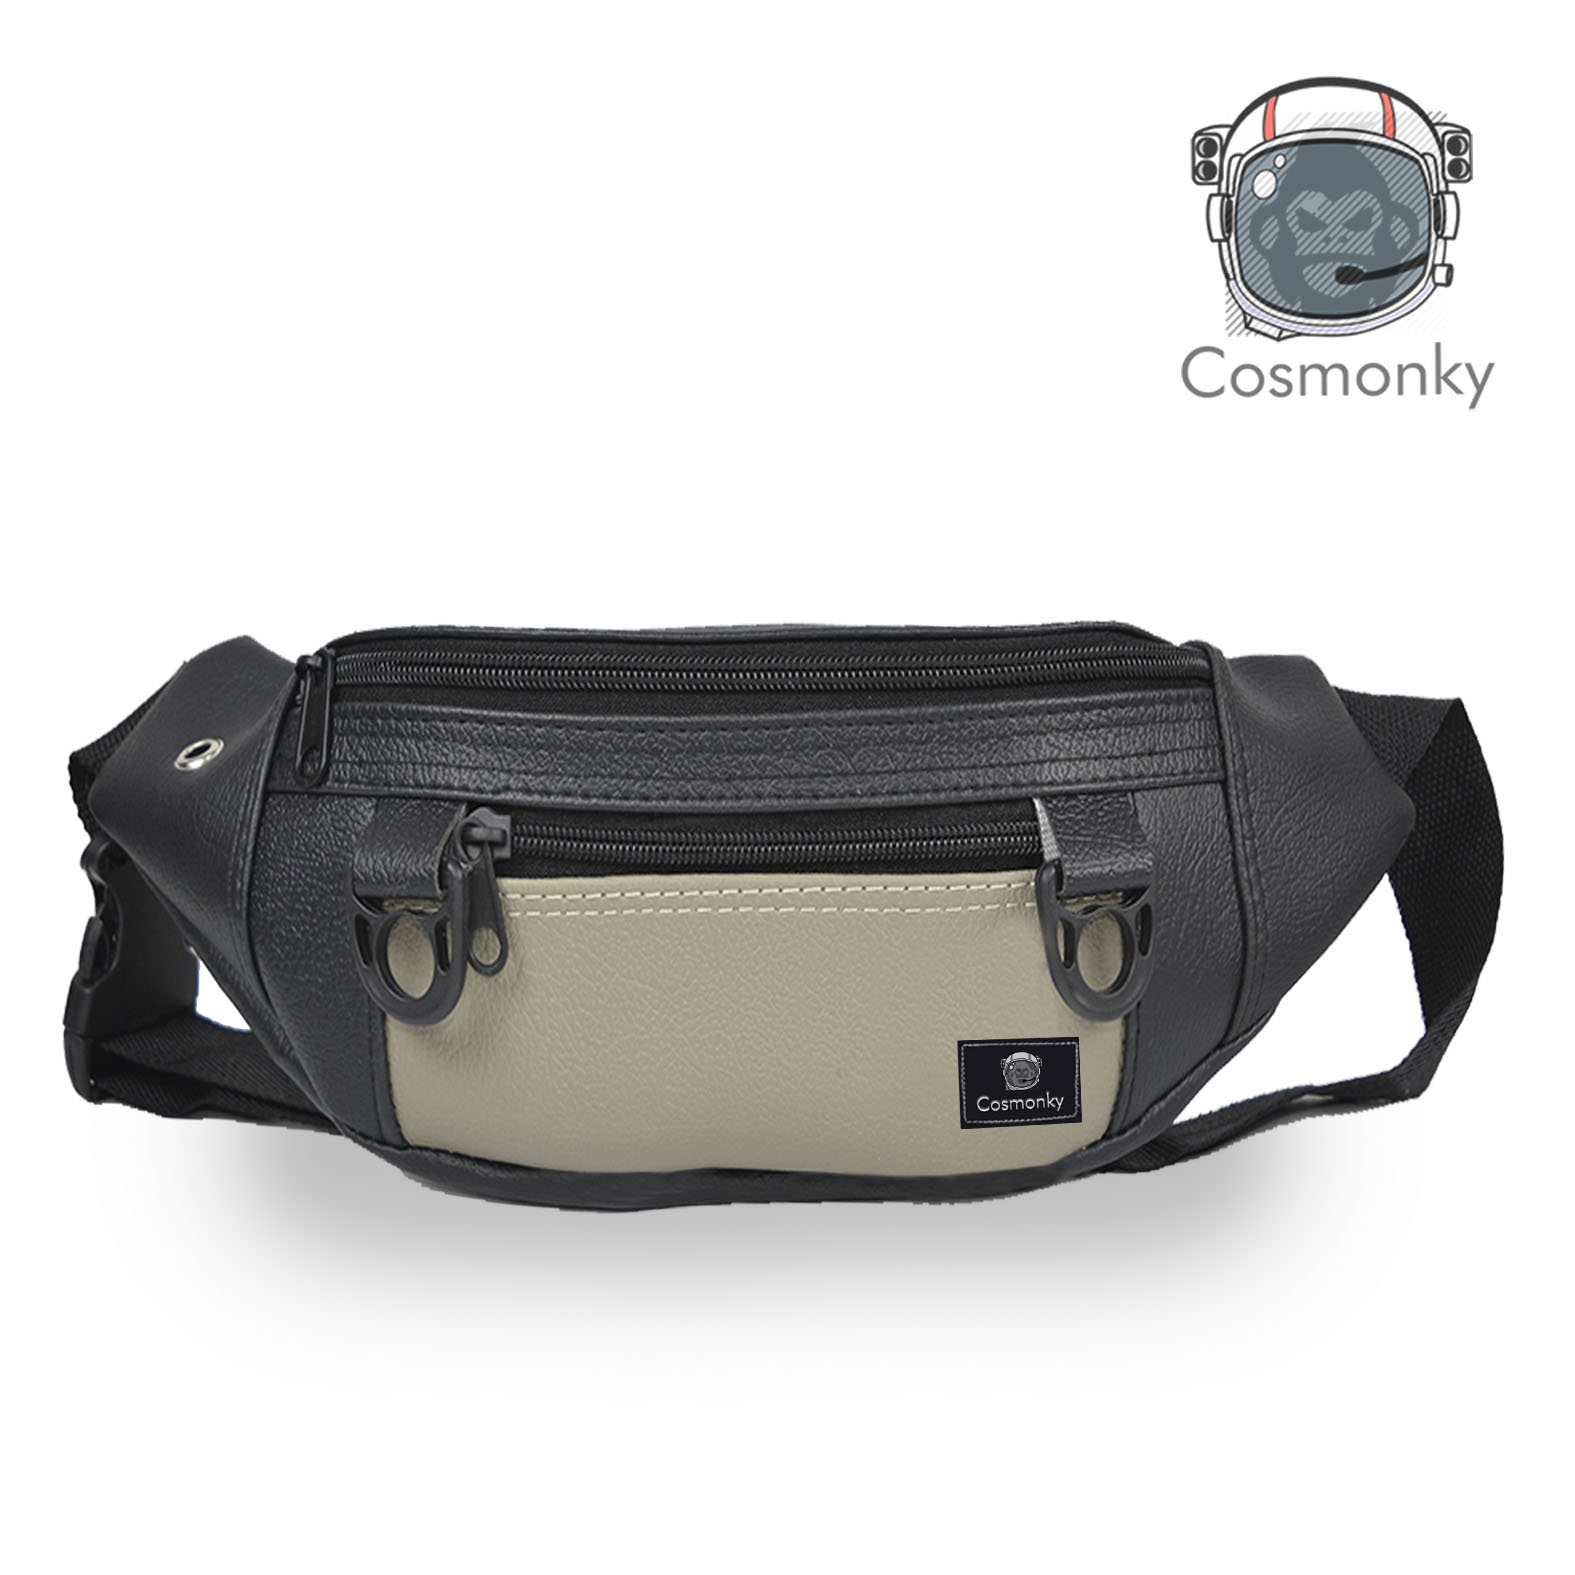 promo tas pinggang waistbag cosmonky jef/tas kulit / crossbody bags / tas selempang casual / tas organizer / tas /enthree